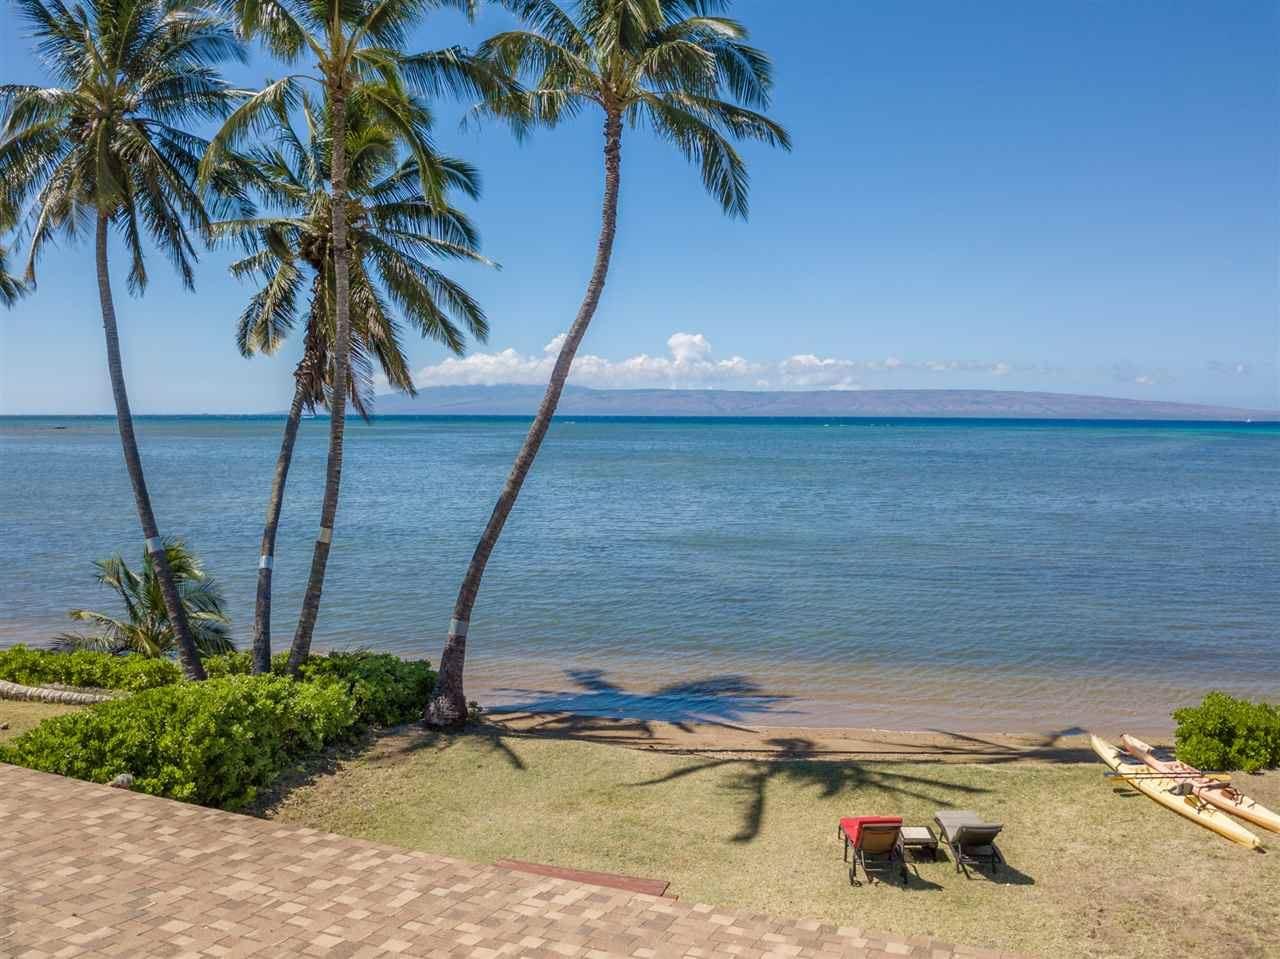 Photo of 2180 Kamehameha V Hwy, Kaunakakai, HI 96748 (MLS # 389475)